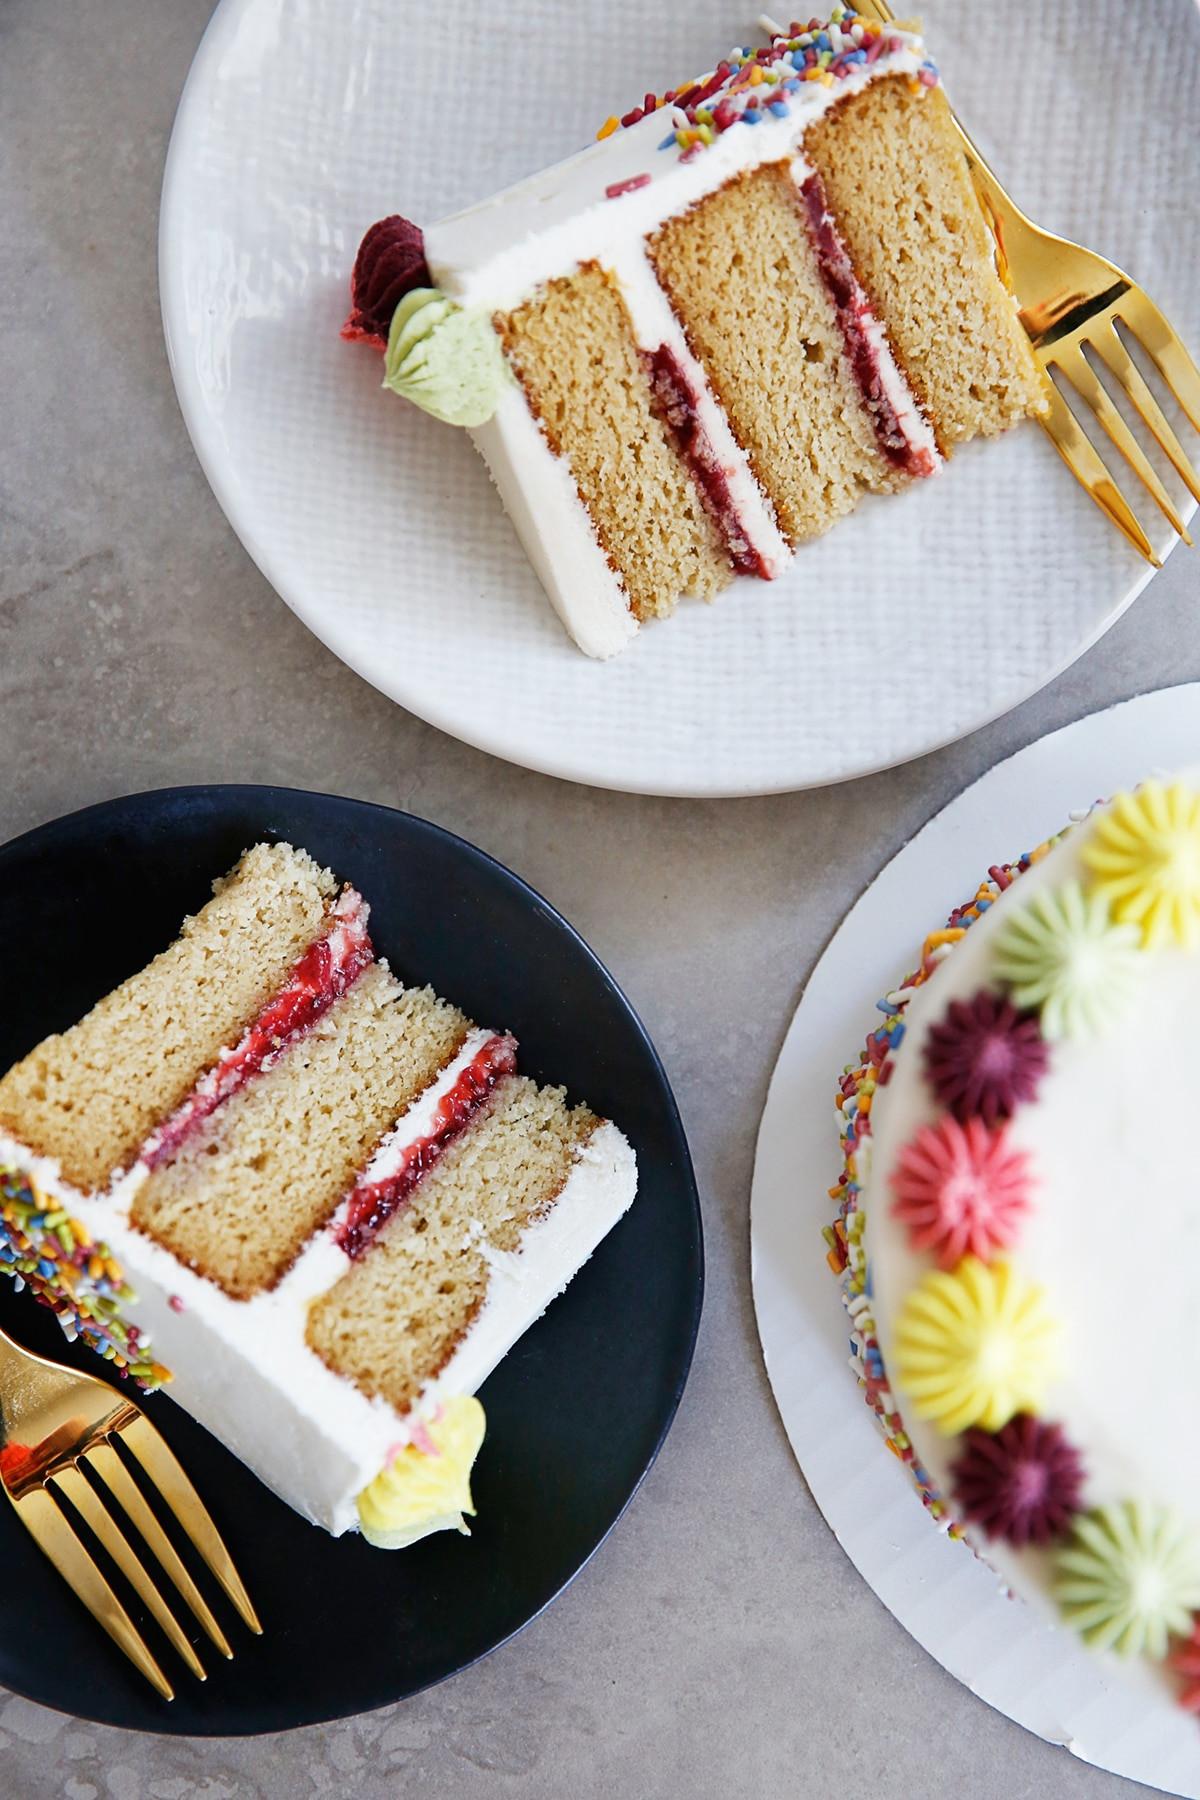 Layered Birthday Cake Recipes  The BEST Gluten Free Layer Birthday Cake Lexi s Clean